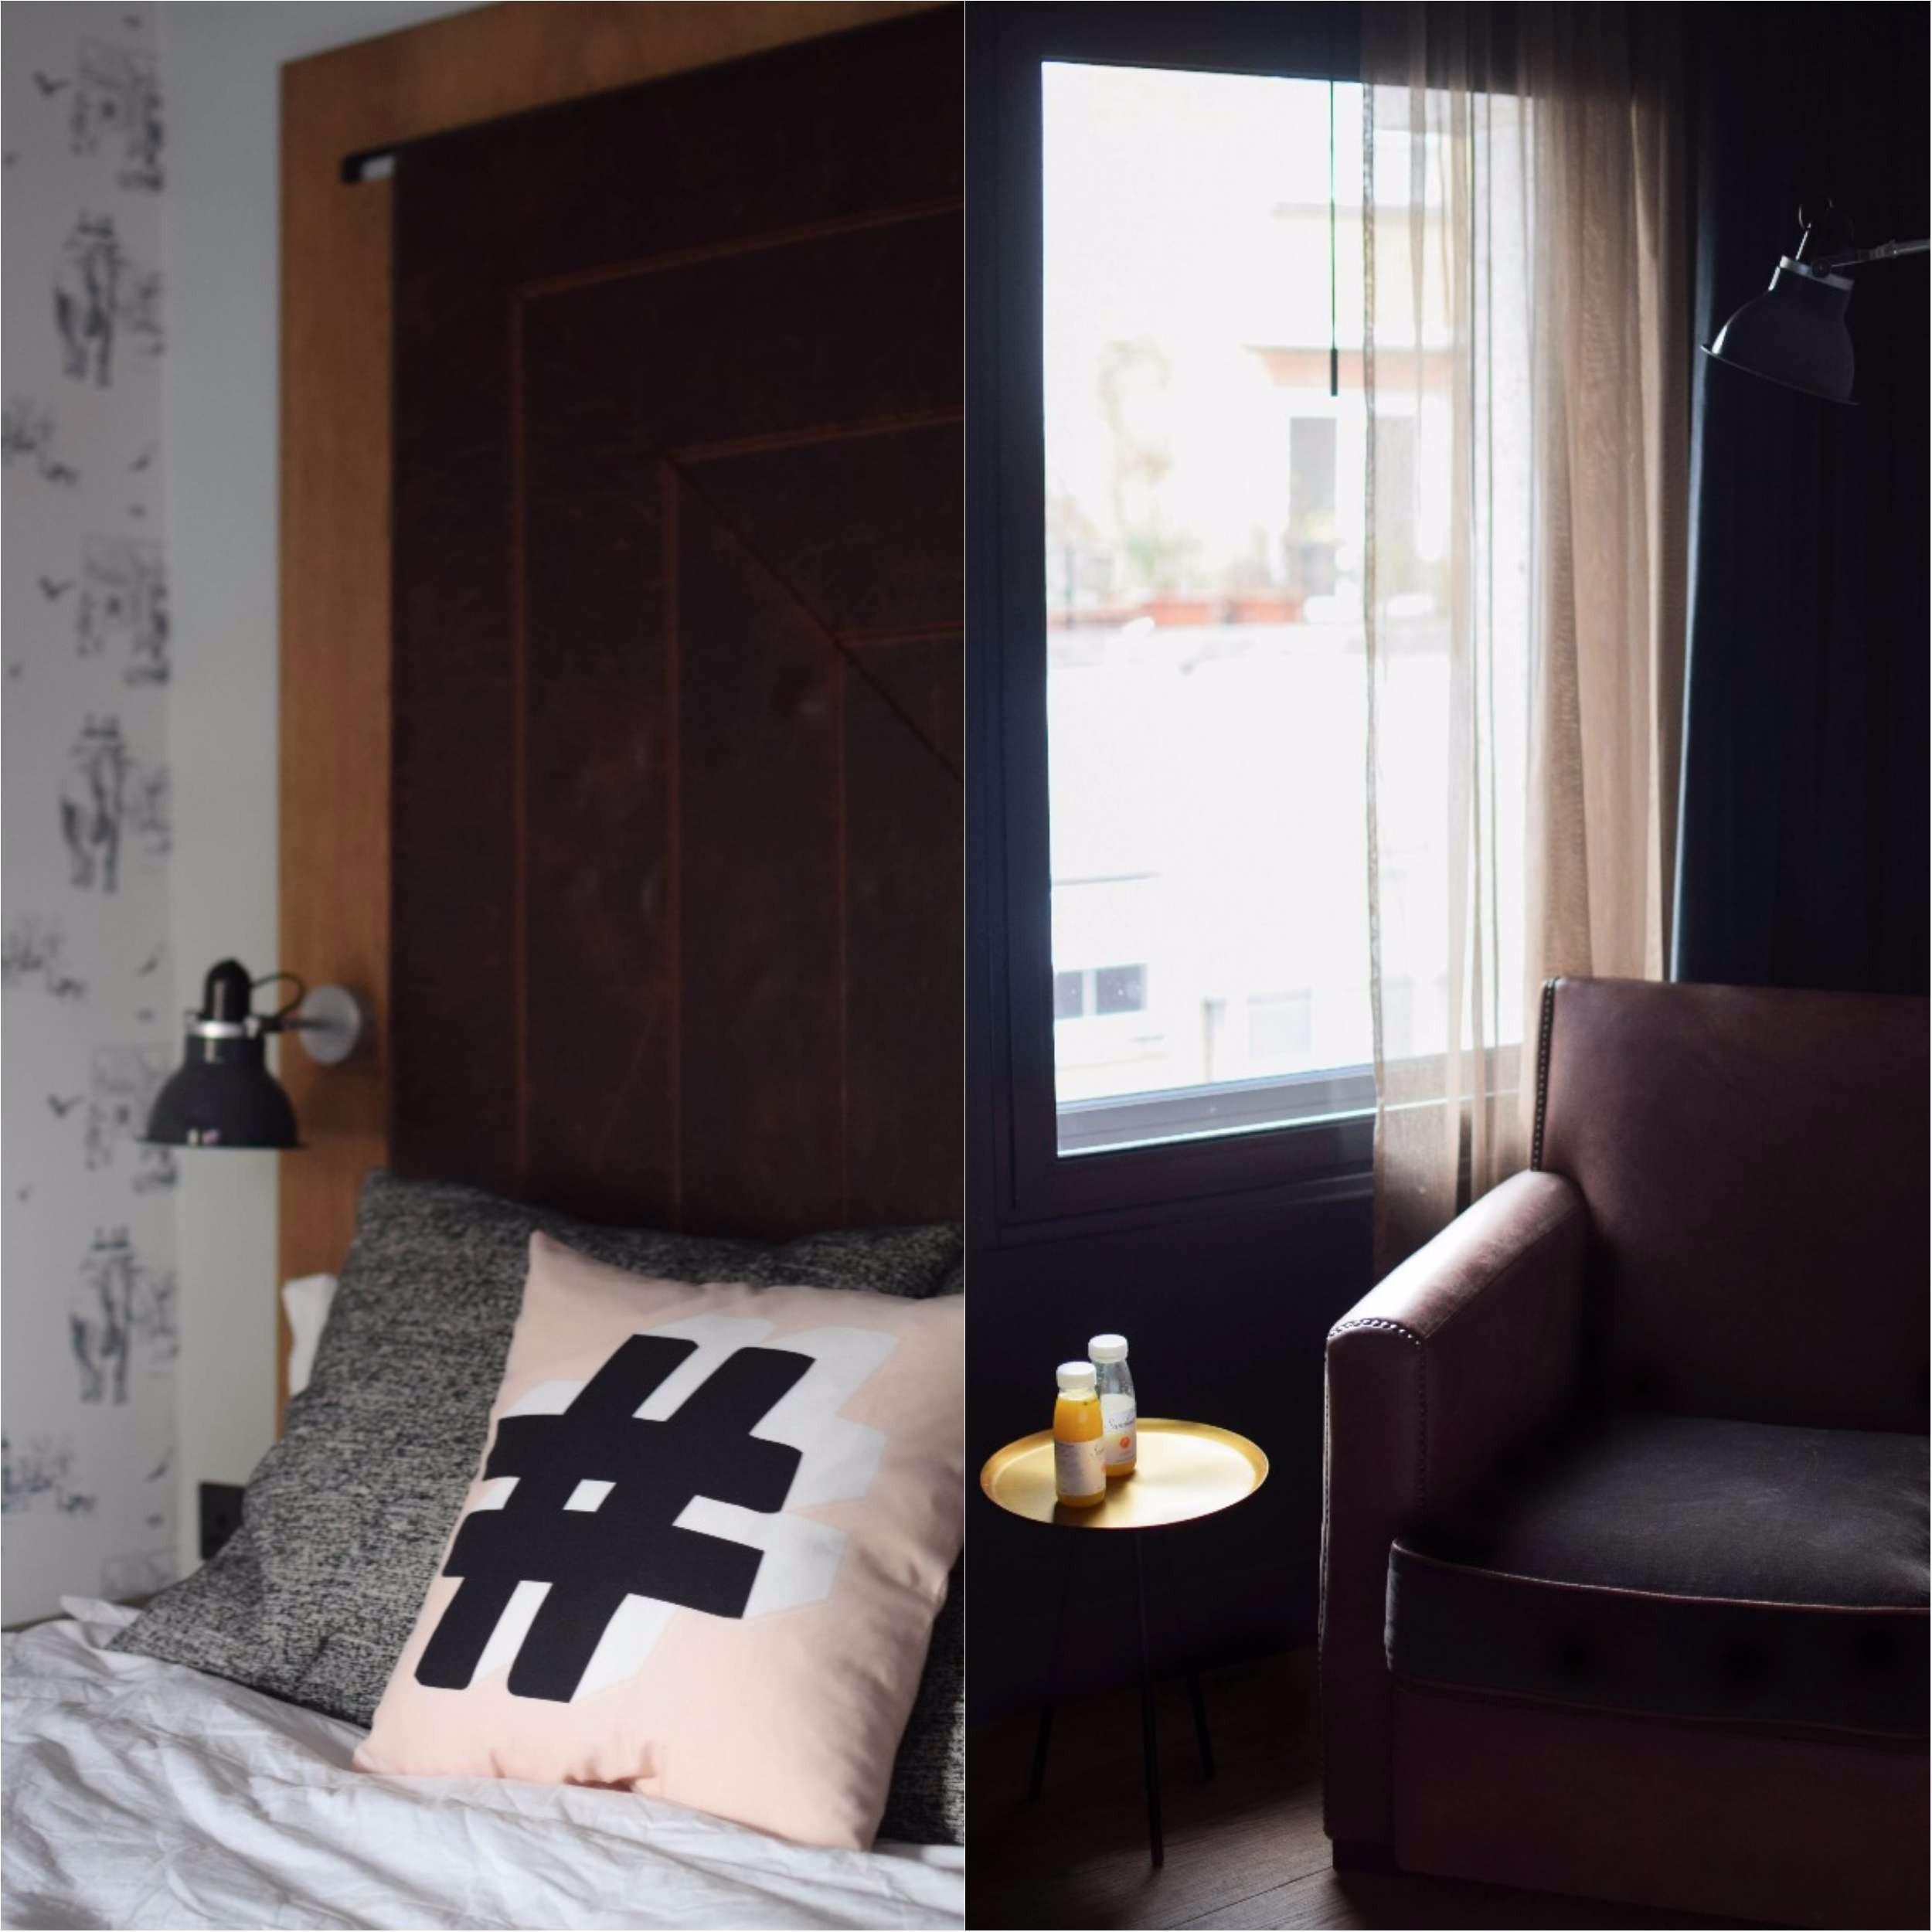 The Hoxton Cozy Room 3